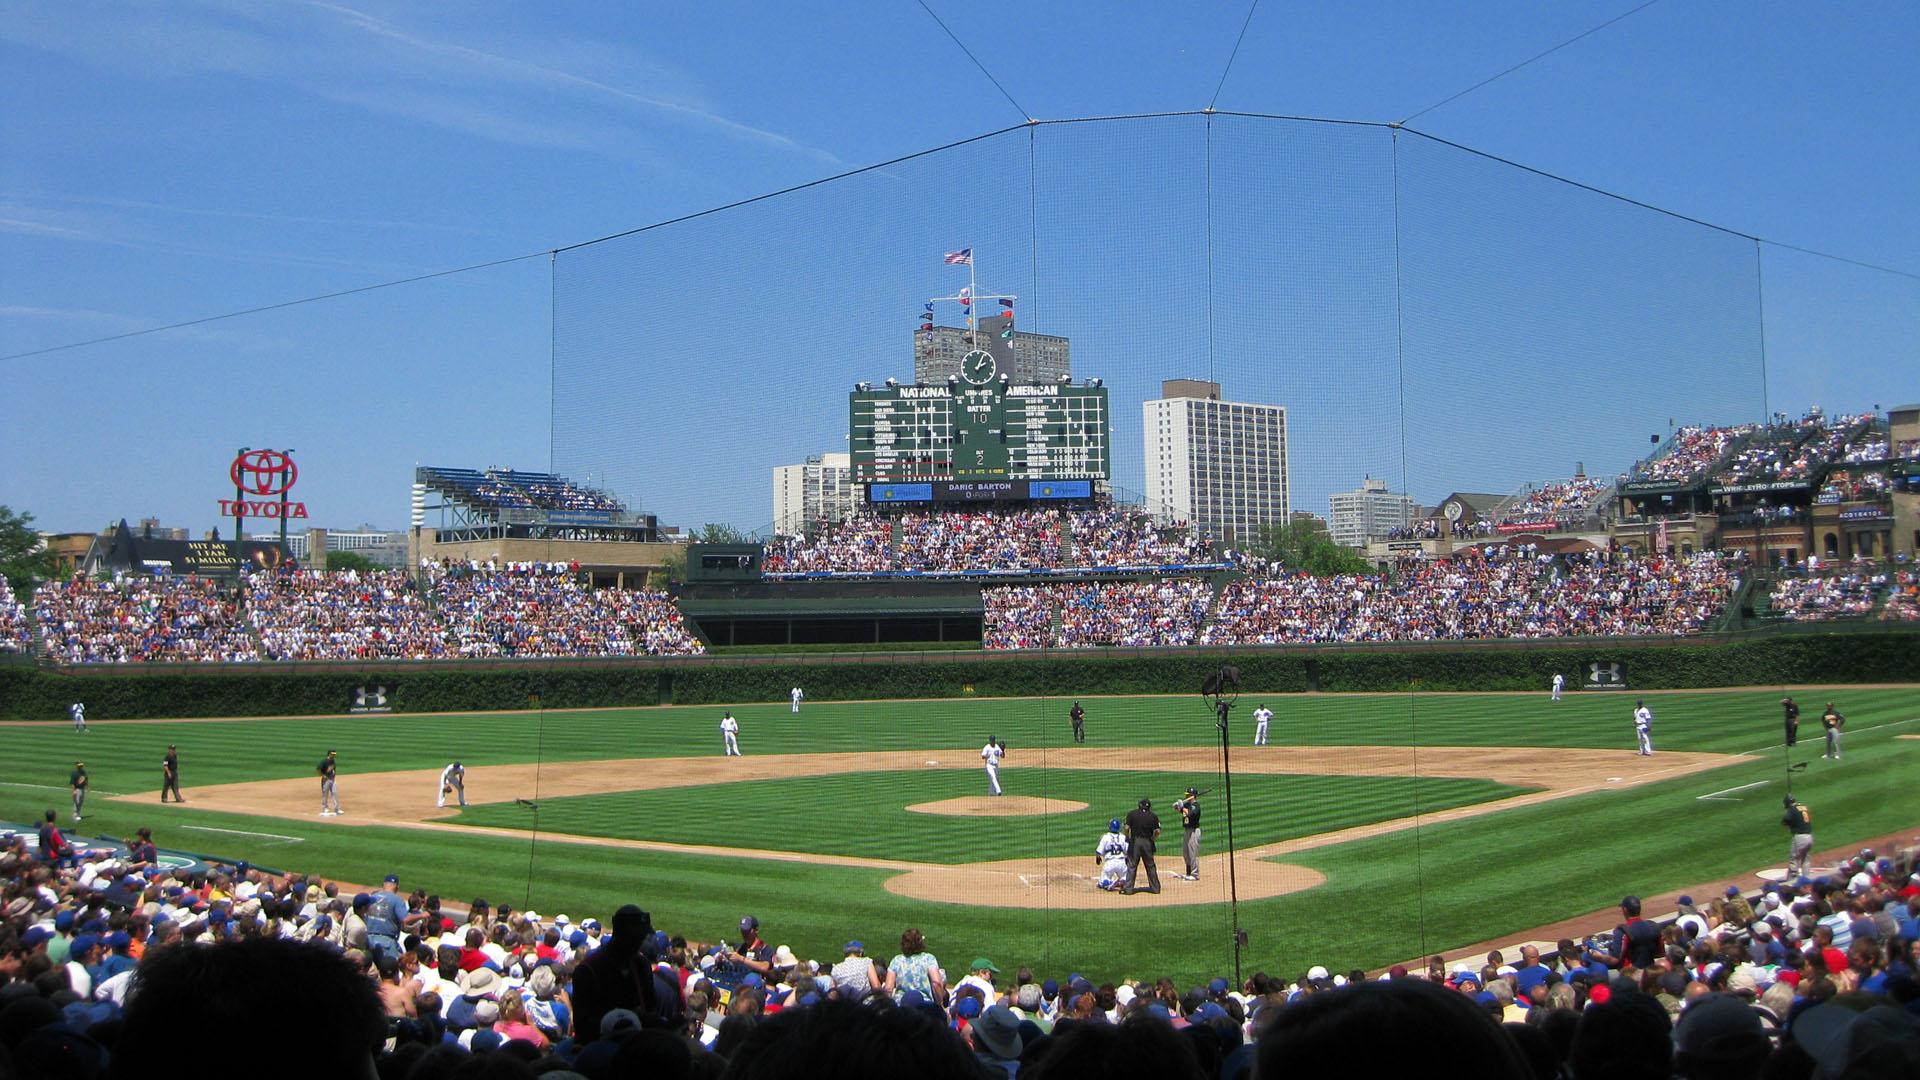 CHICAGO CUBS mlb baseball 22 wallpaper 1920x1080 232528 1920x1080